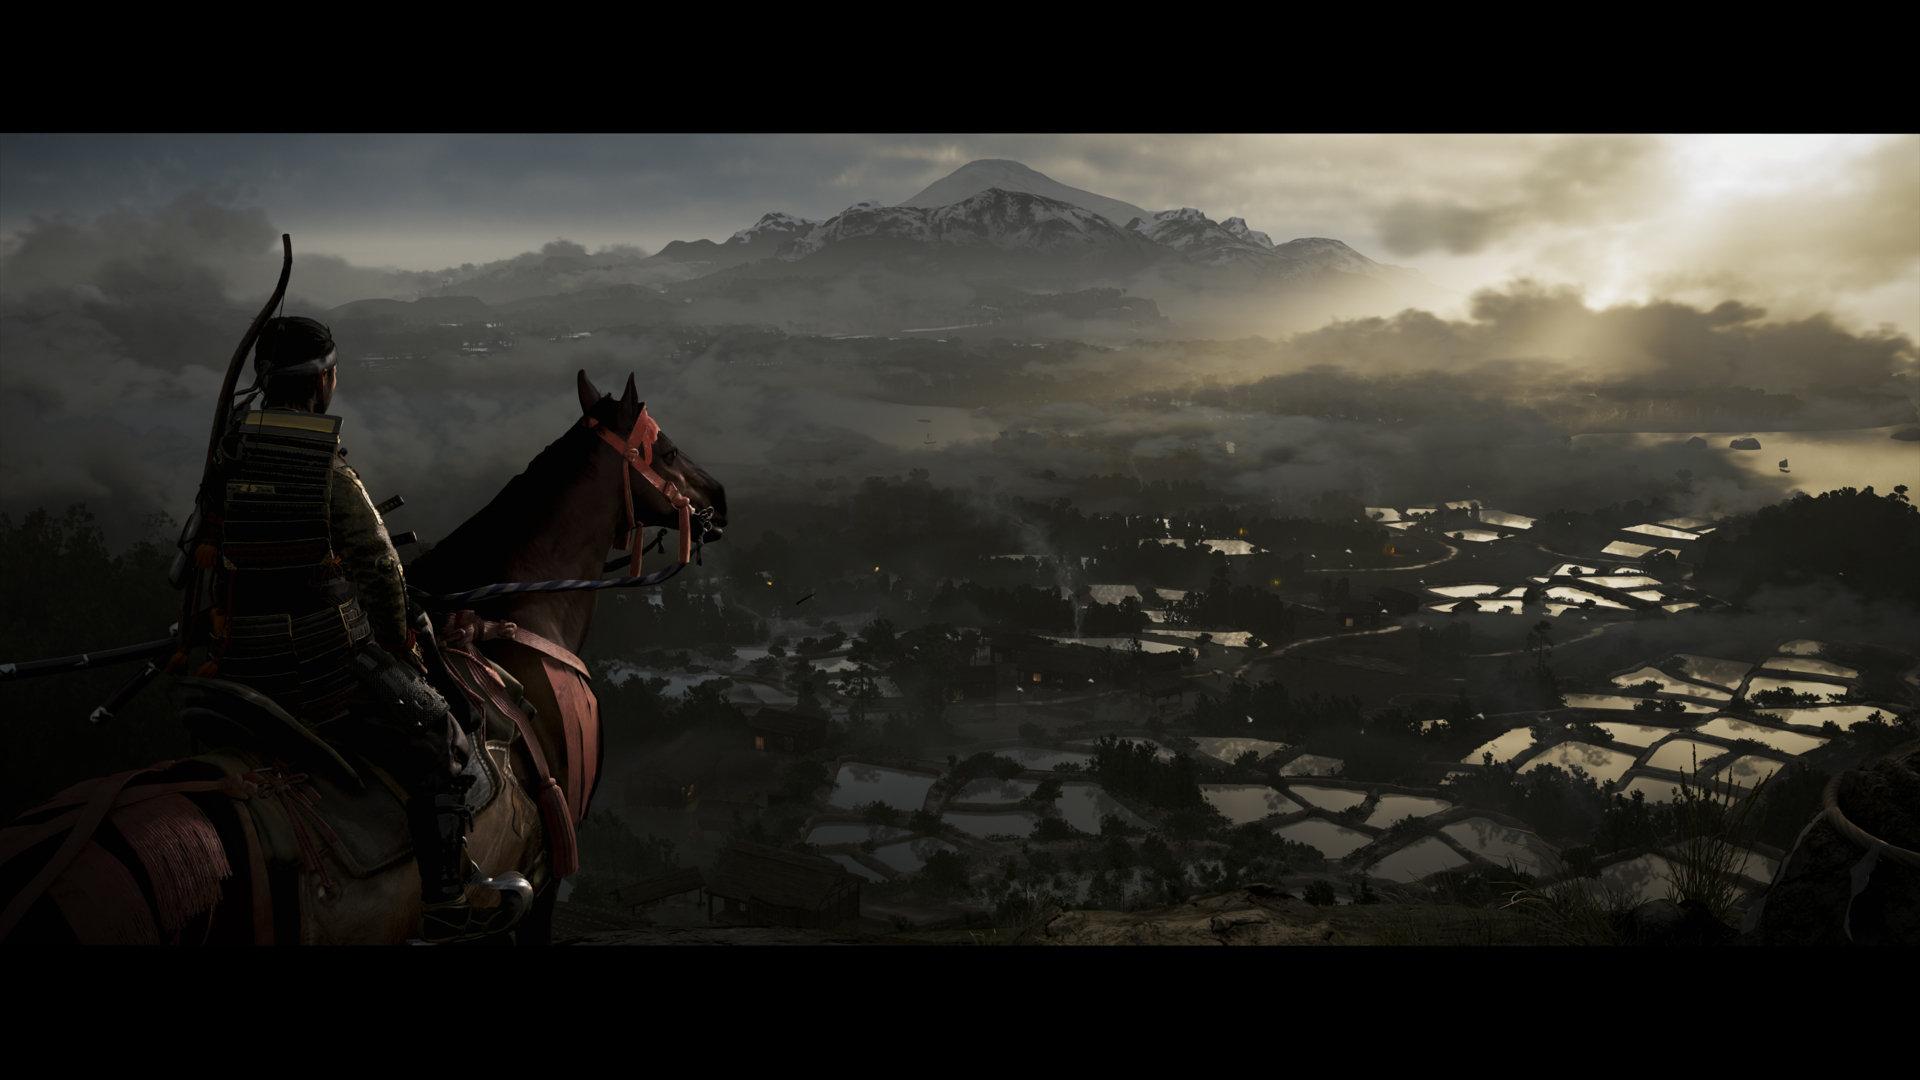 Story Settings in Video Games